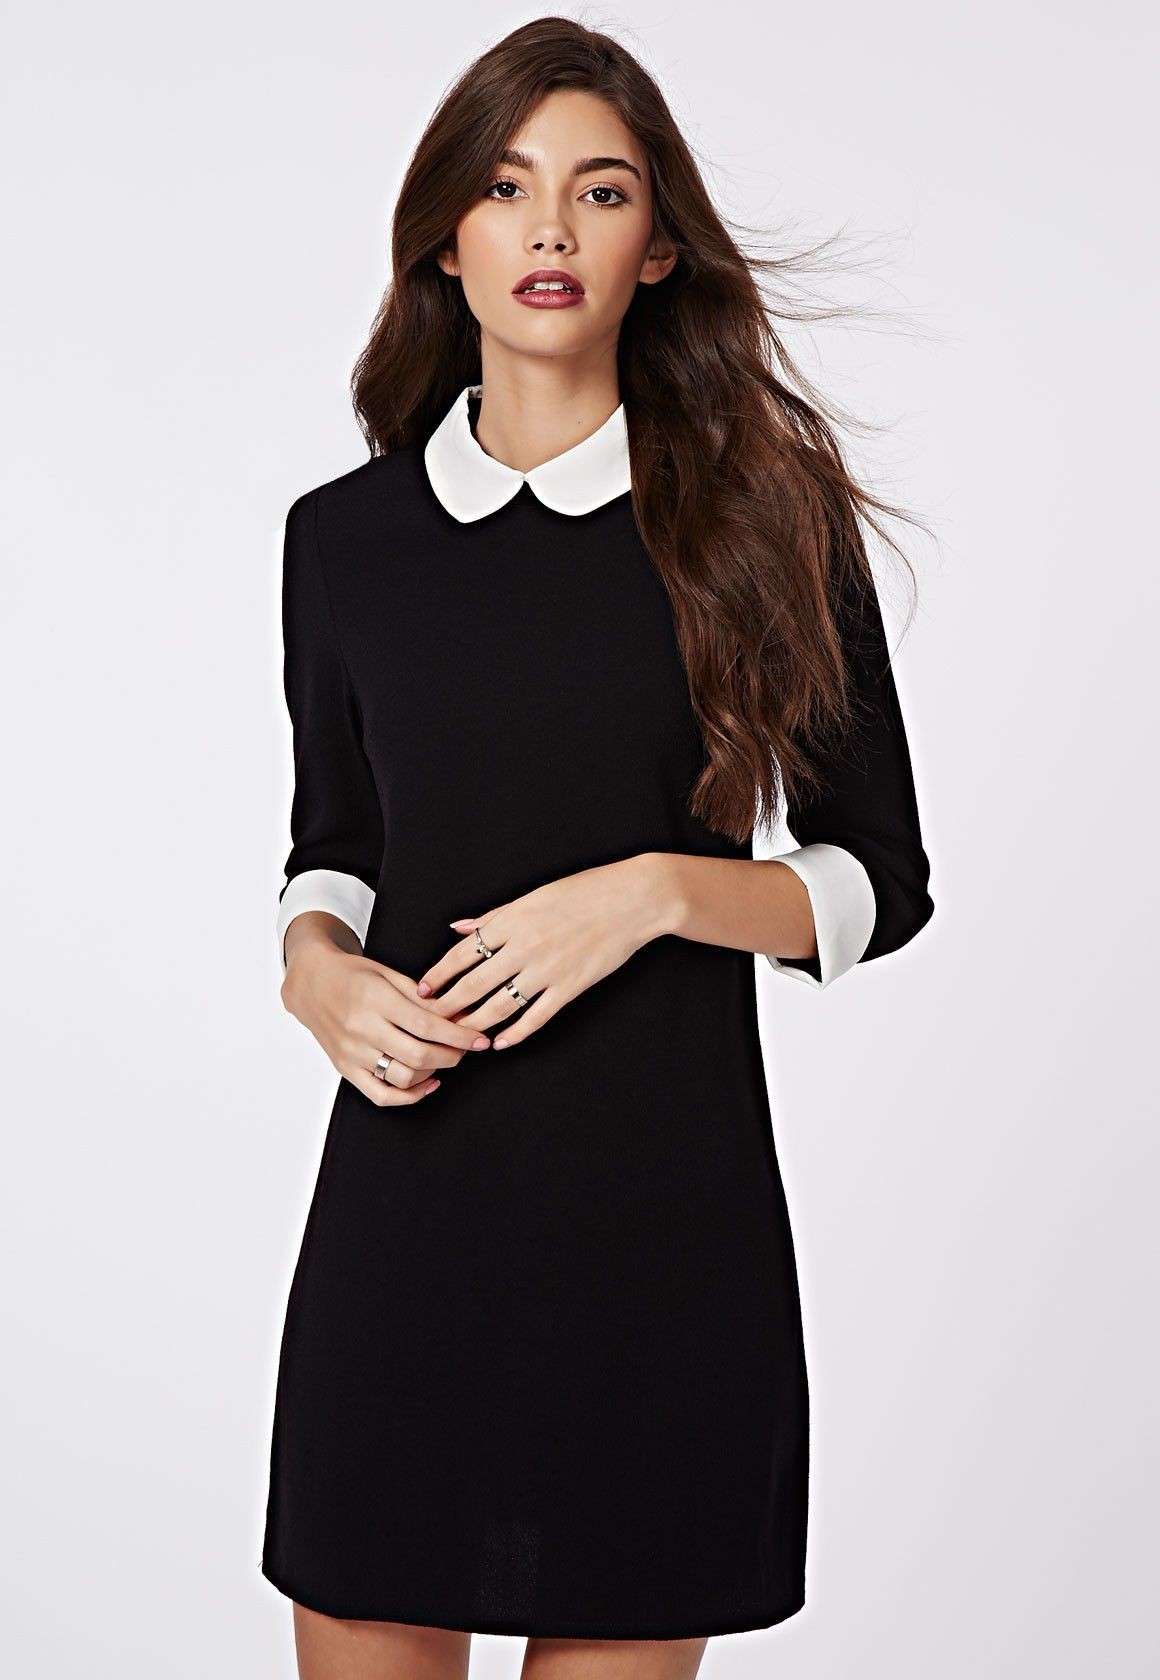 missguided robe droite col claudine shayne noir et blanc mode pinterest peter pan. Black Bedroom Furniture Sets. Home Design Ideas